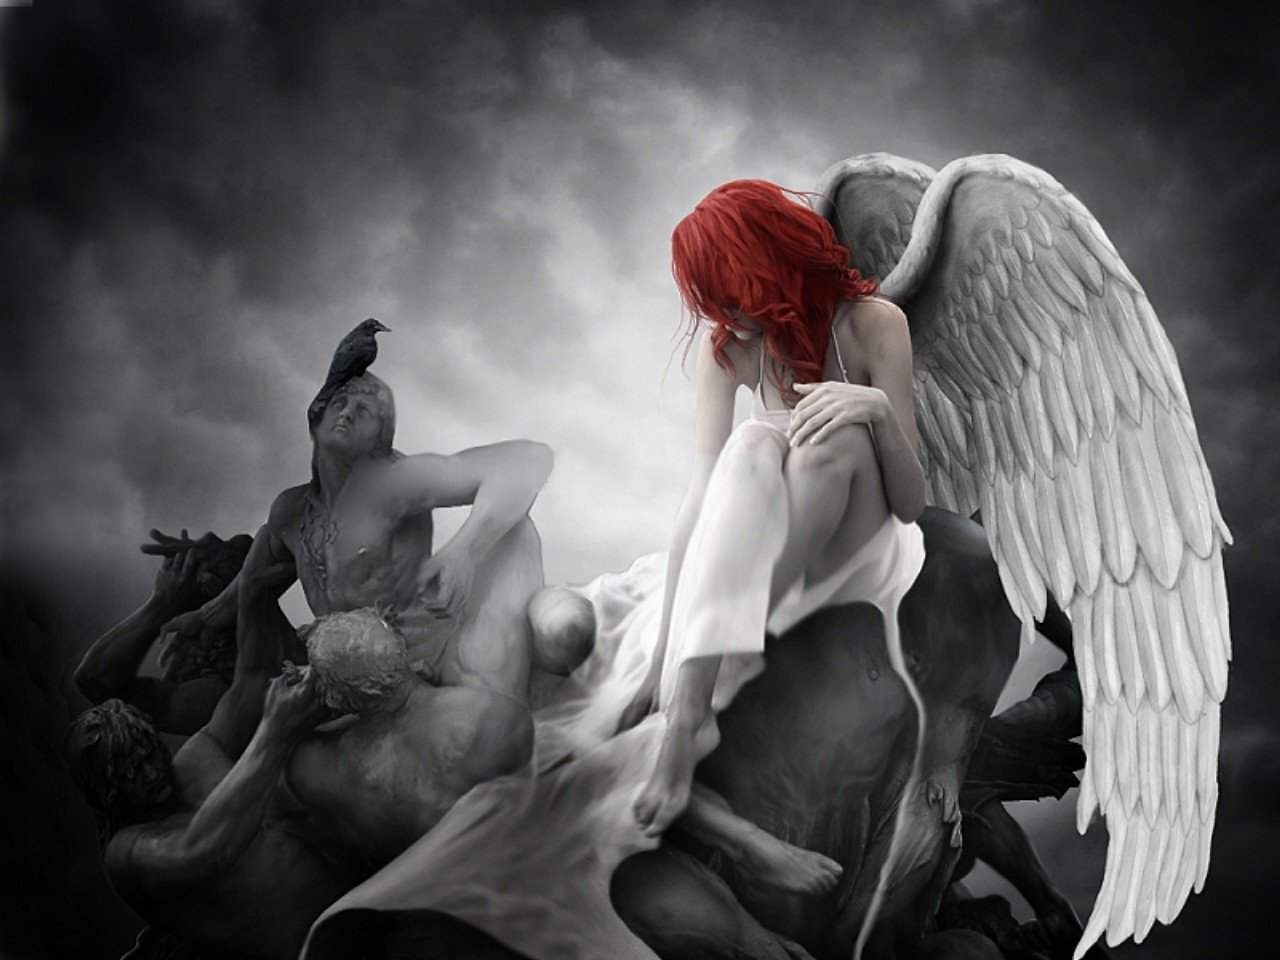 Fantasy Angel Wallpapers Download Wallpaper DaWallpaperz 1280x960